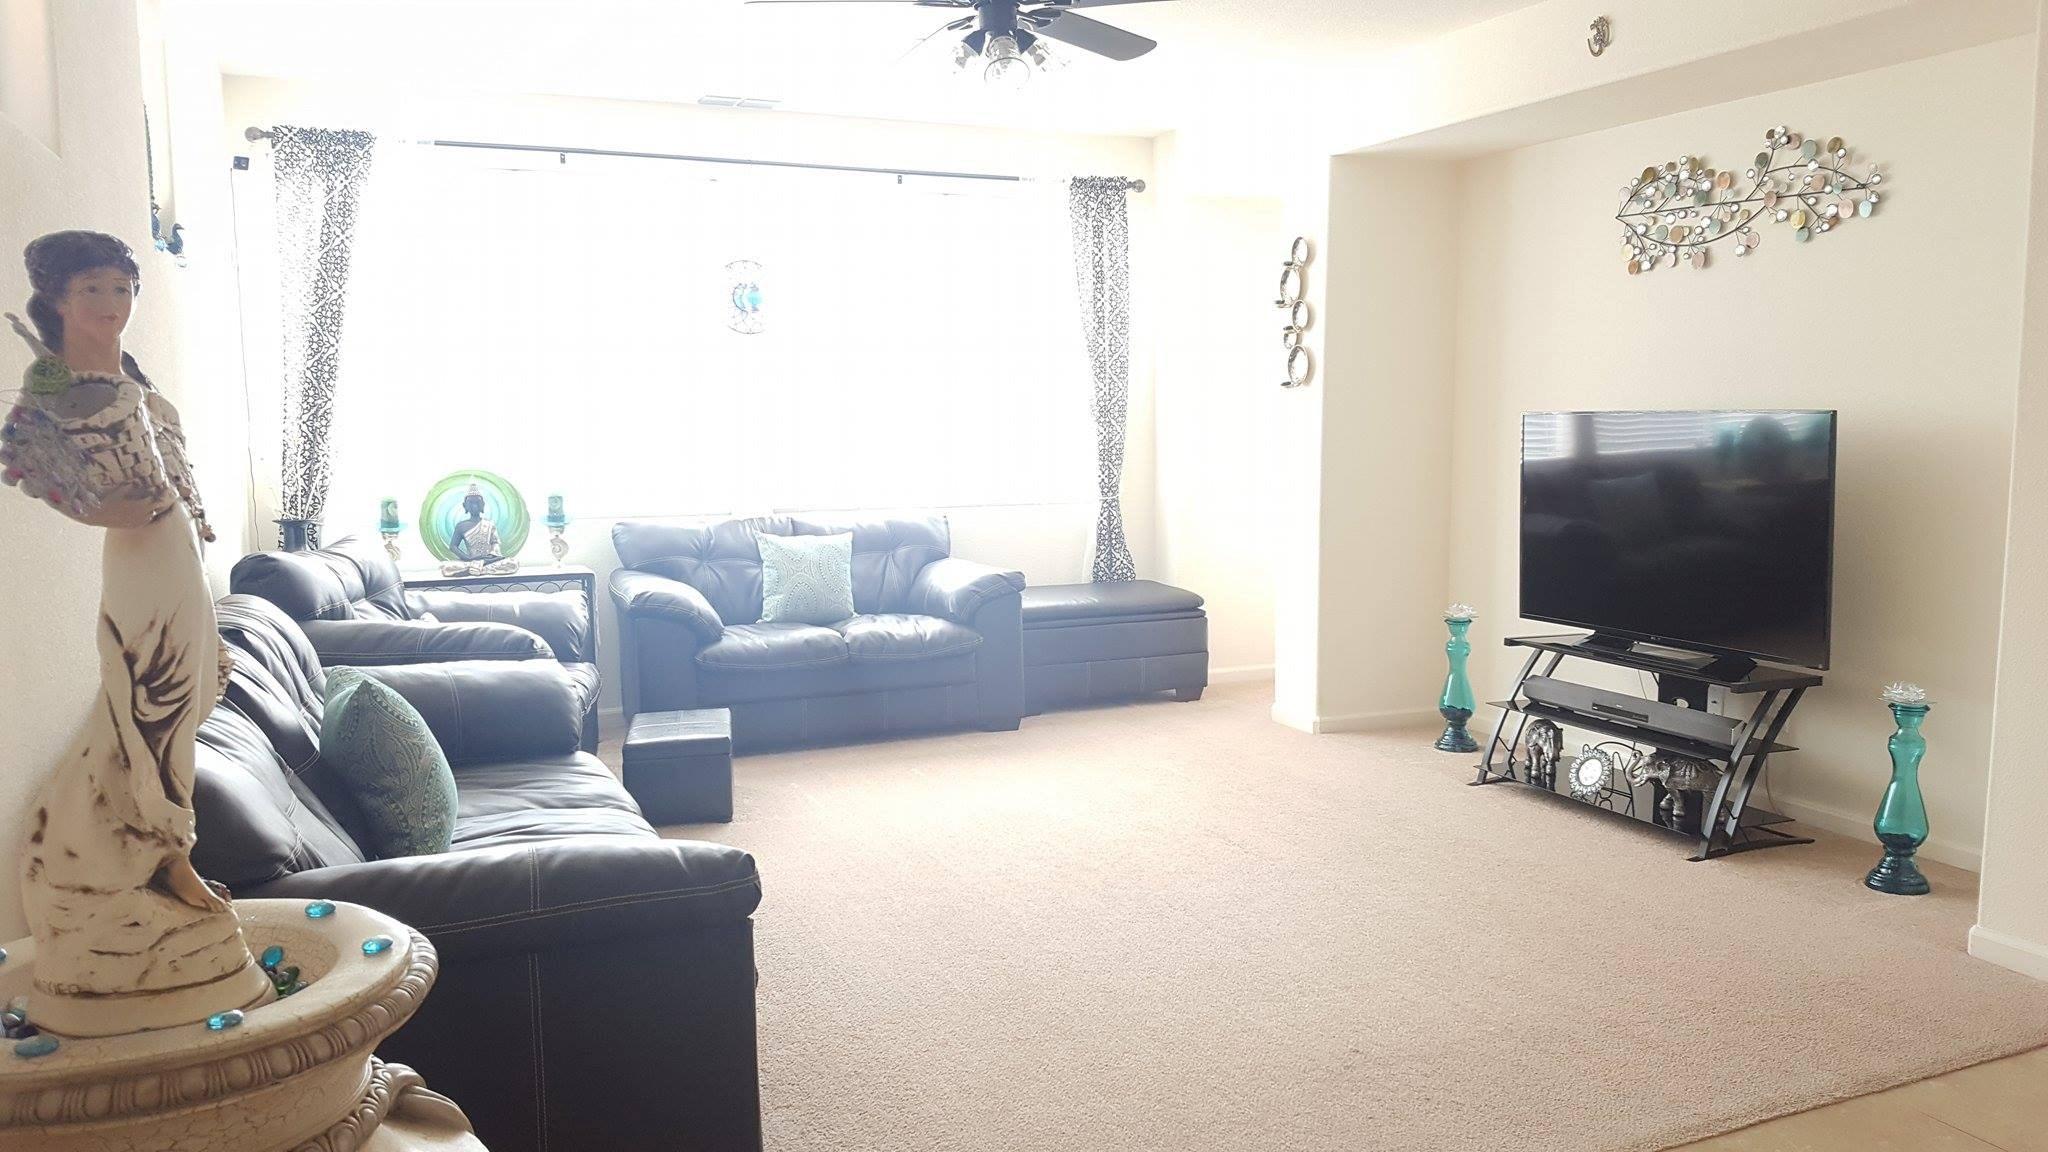 Room For Rent in Sacramento CA | 611822 - Sulekha Roommates